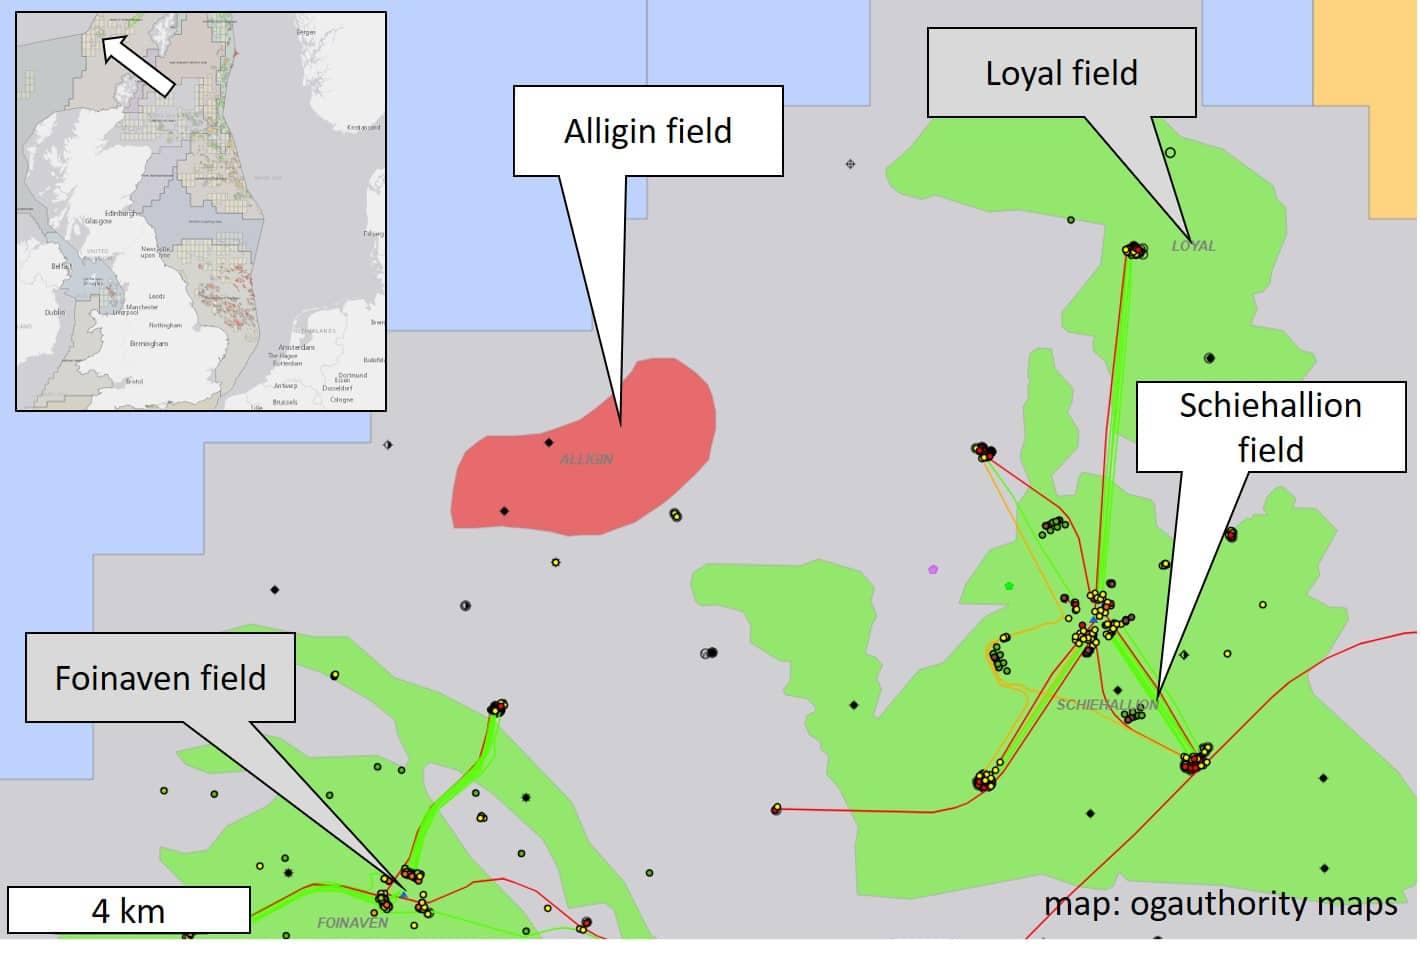 UKCS: First oil from BP's Alligin field